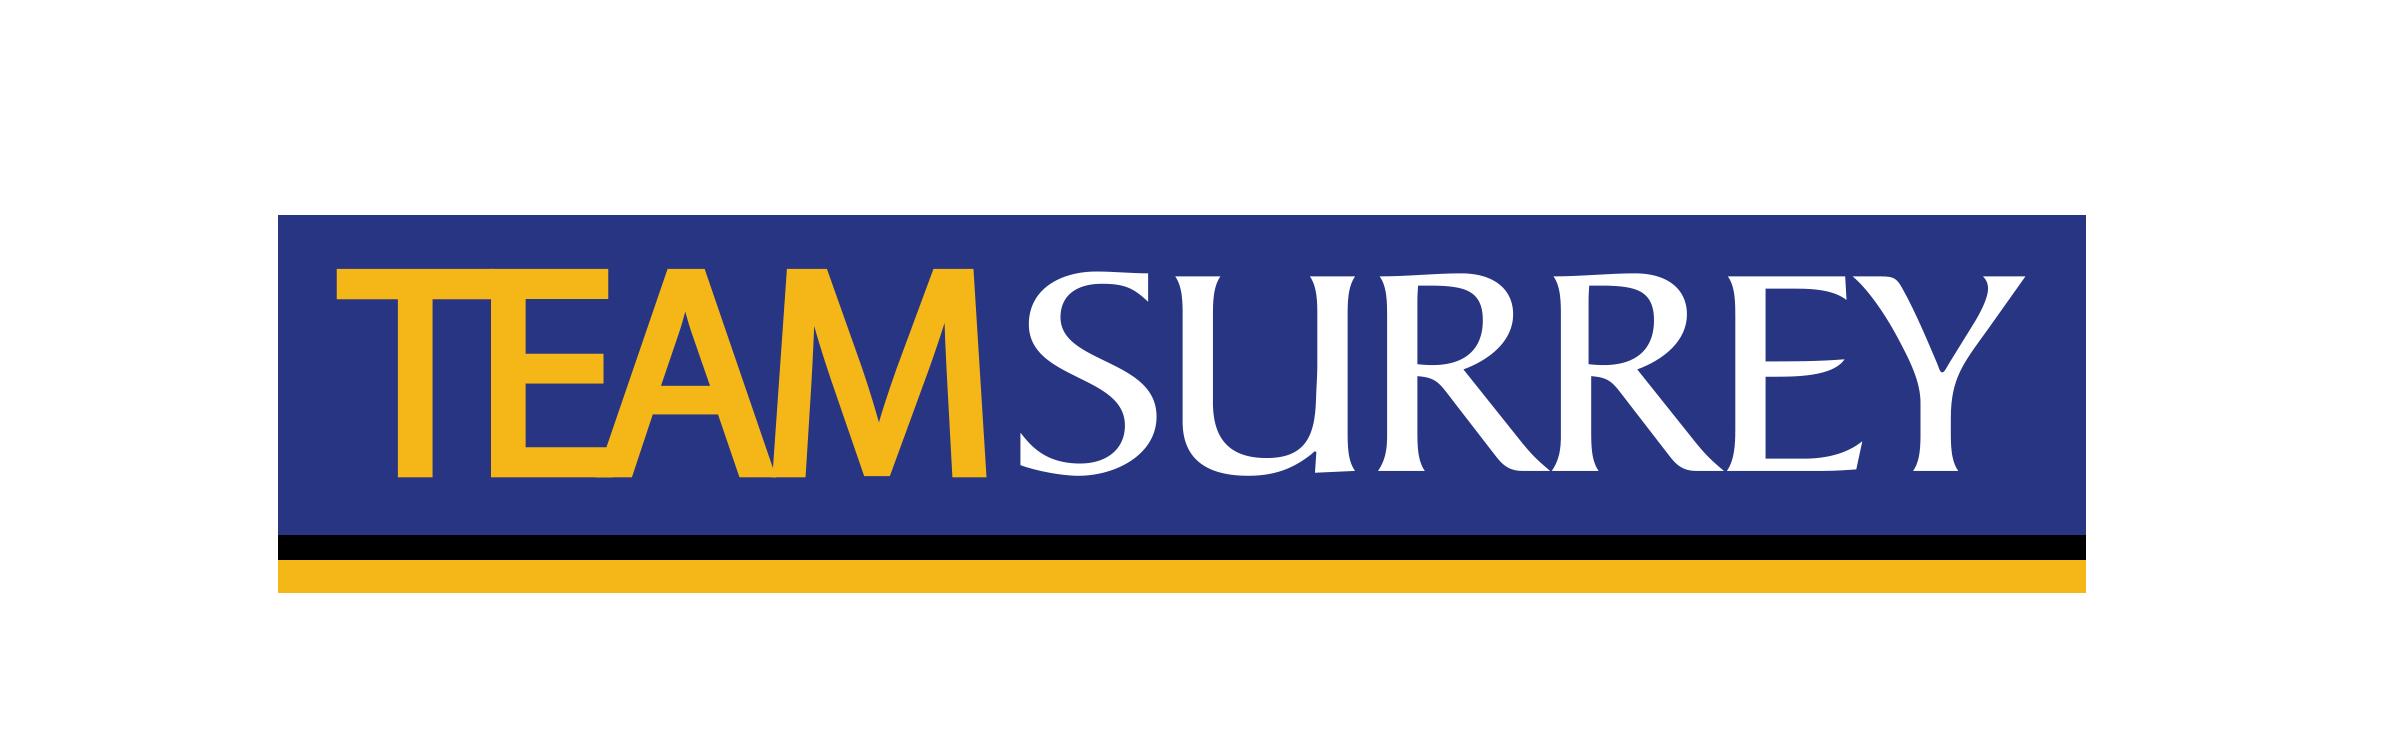 team-surrey-logo